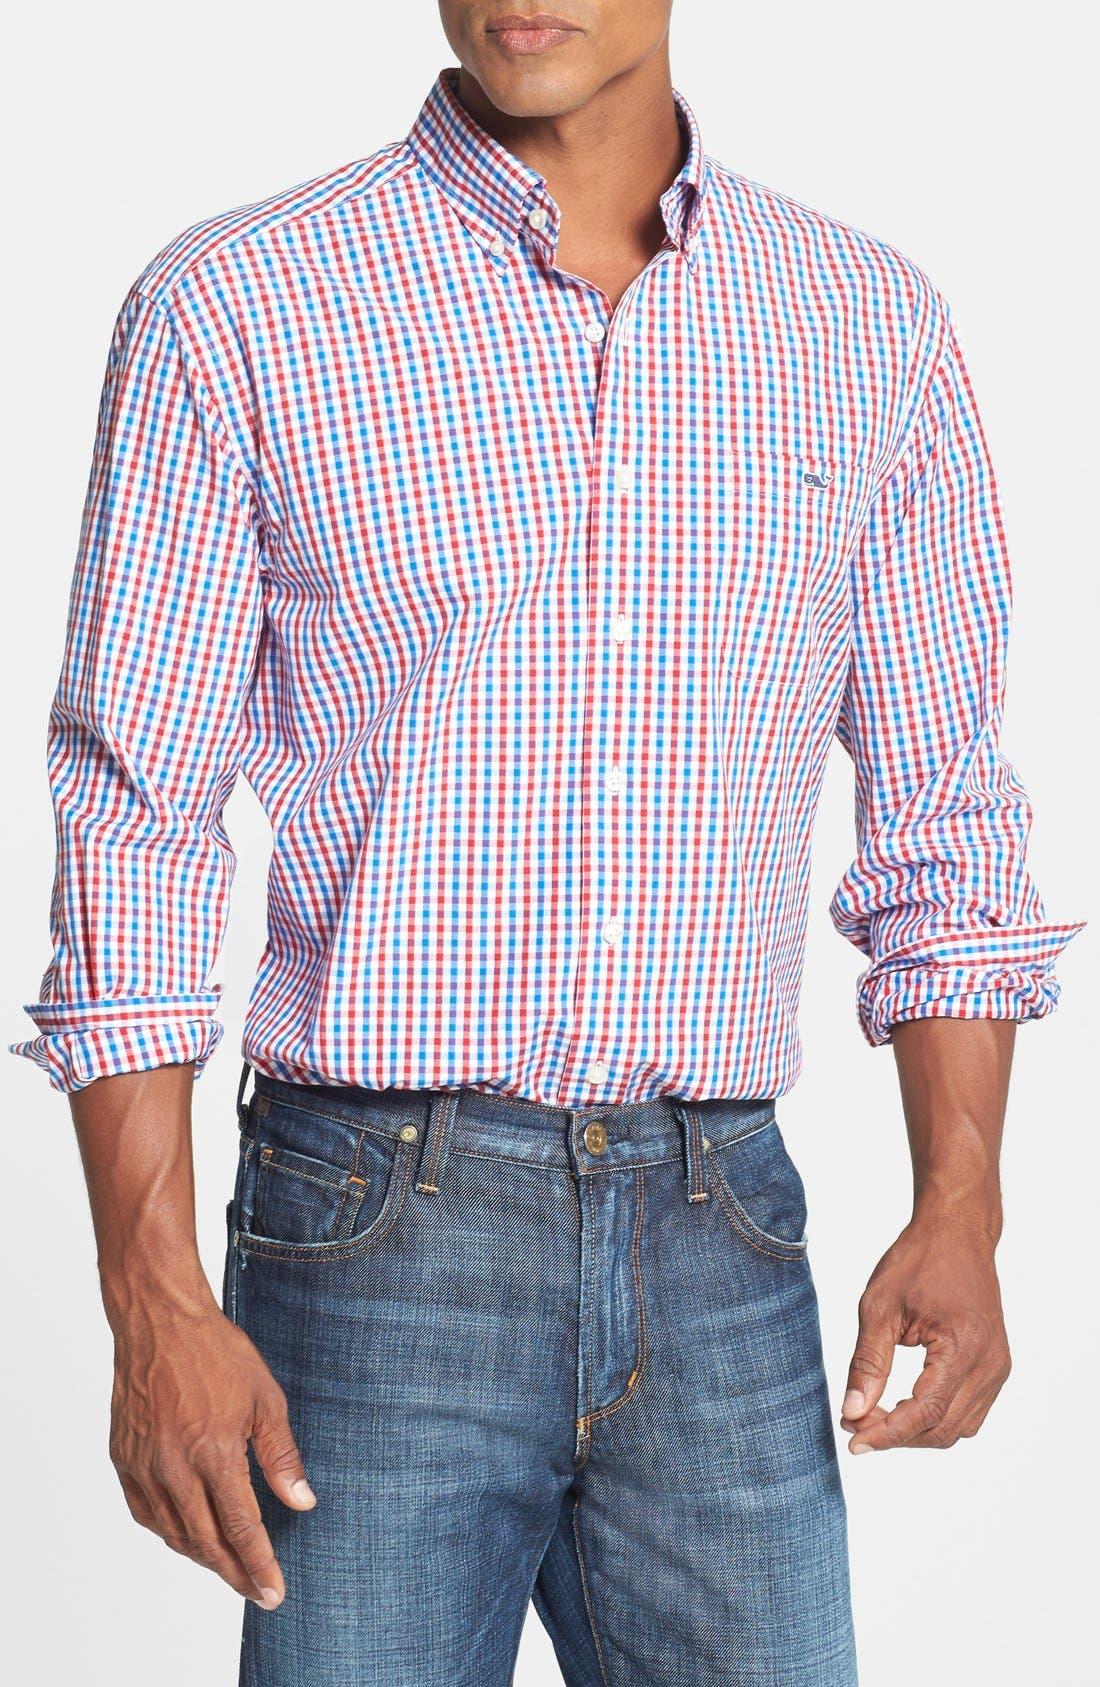 Main Image - Vineyard Vines 'Tucker - Bailey's Bay' Classic Fit Tattersall Sport Shirt